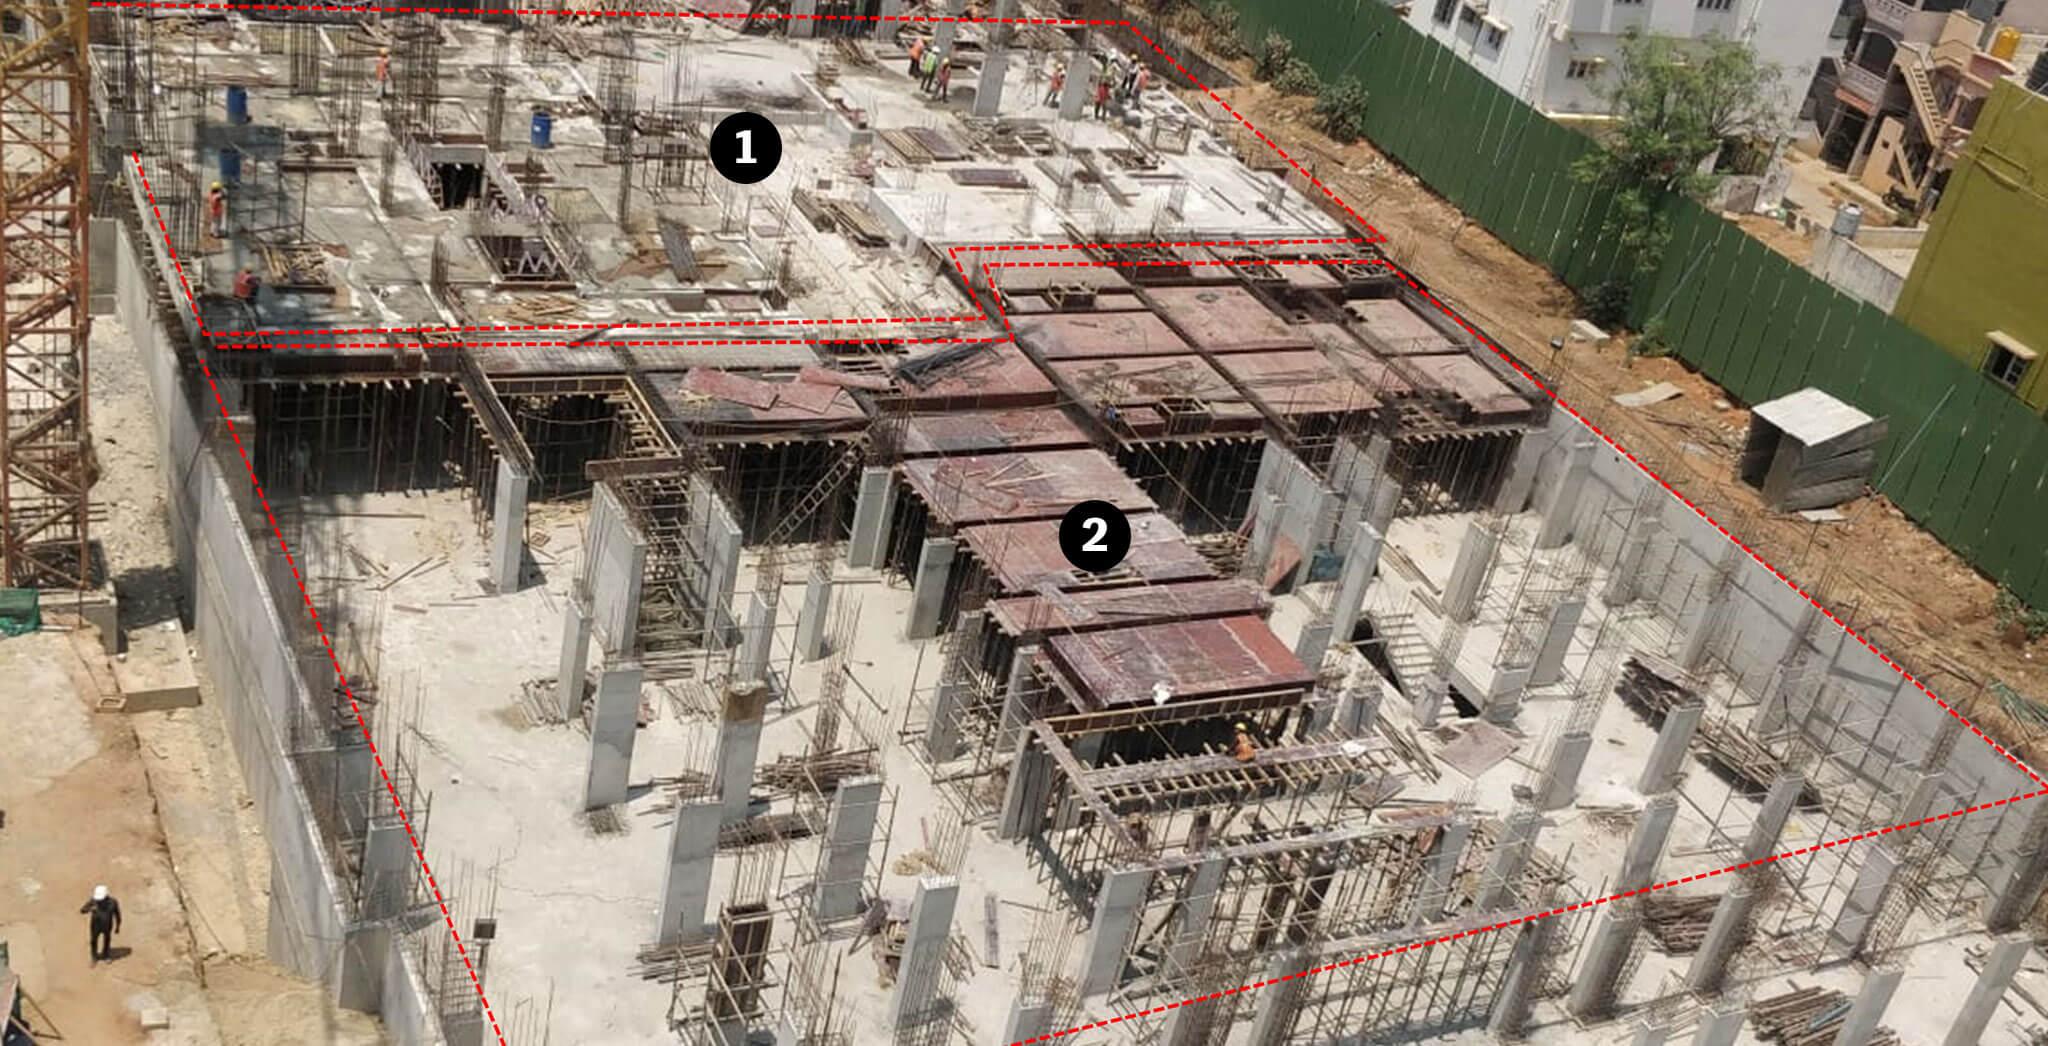 Mar 2019 - Block-E: 1) GF Slab completed. FF columns casting in progress 2) GF Slab shuttering in progress